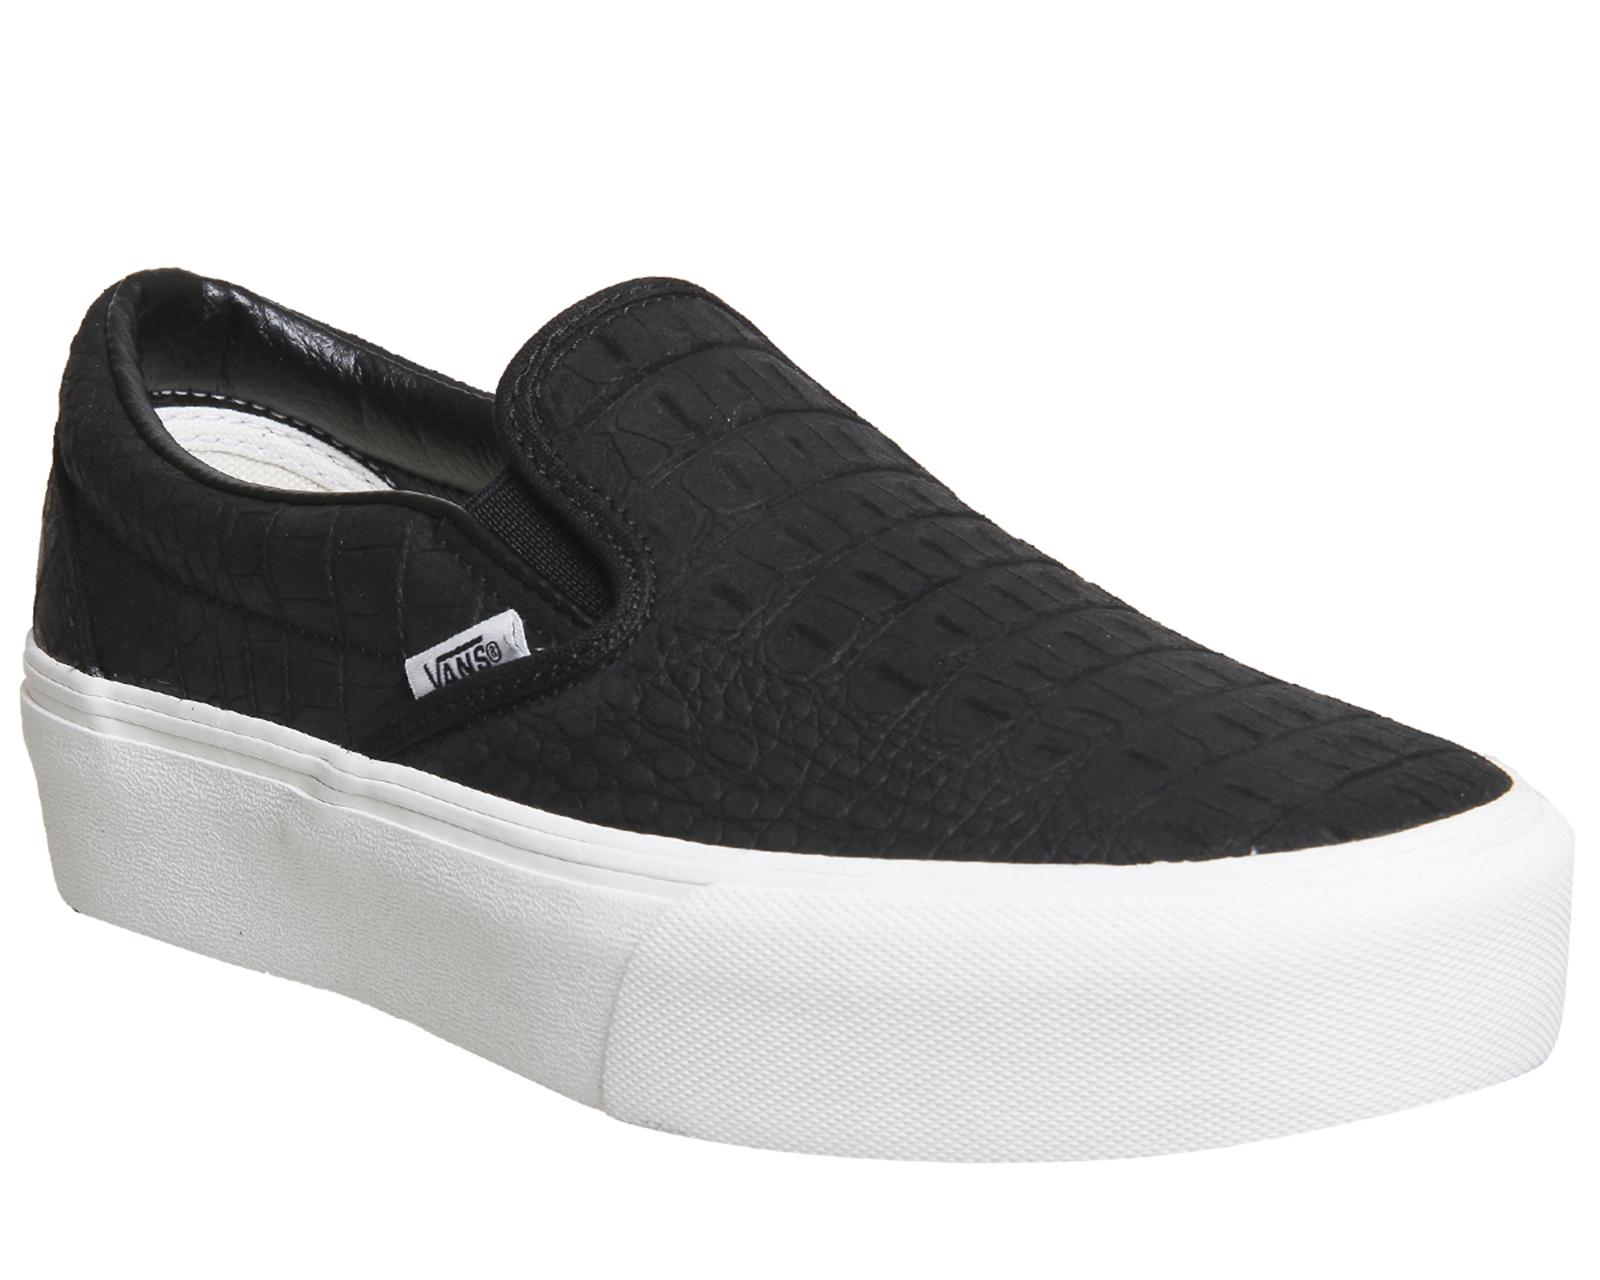 dee092f33b Sentinel Womens Vans Slip On Platform Trainers EMBOSSED BLACK WHITE  Trainers Shoes